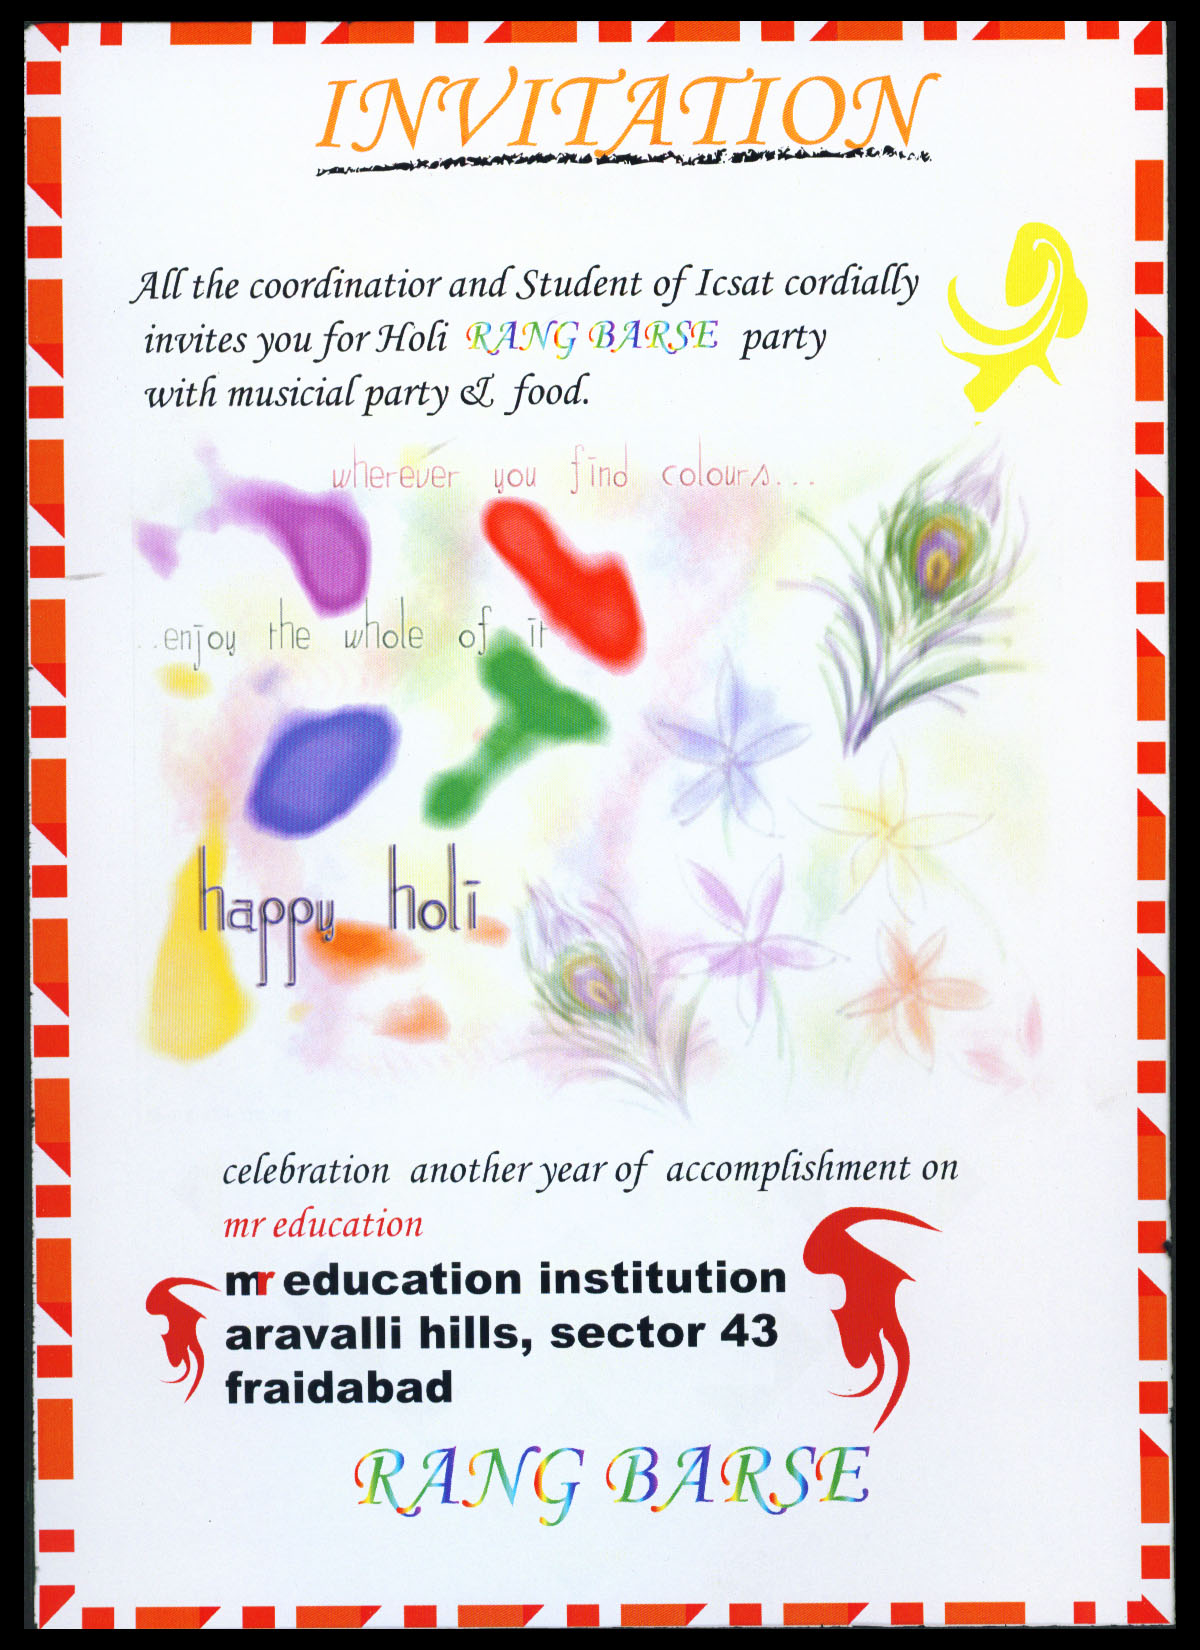 11 beautiful contoh invitation card birthday party ebookzdbcom invitation card contoh invitation card birthday party bahasa inggris stopboris Image collections